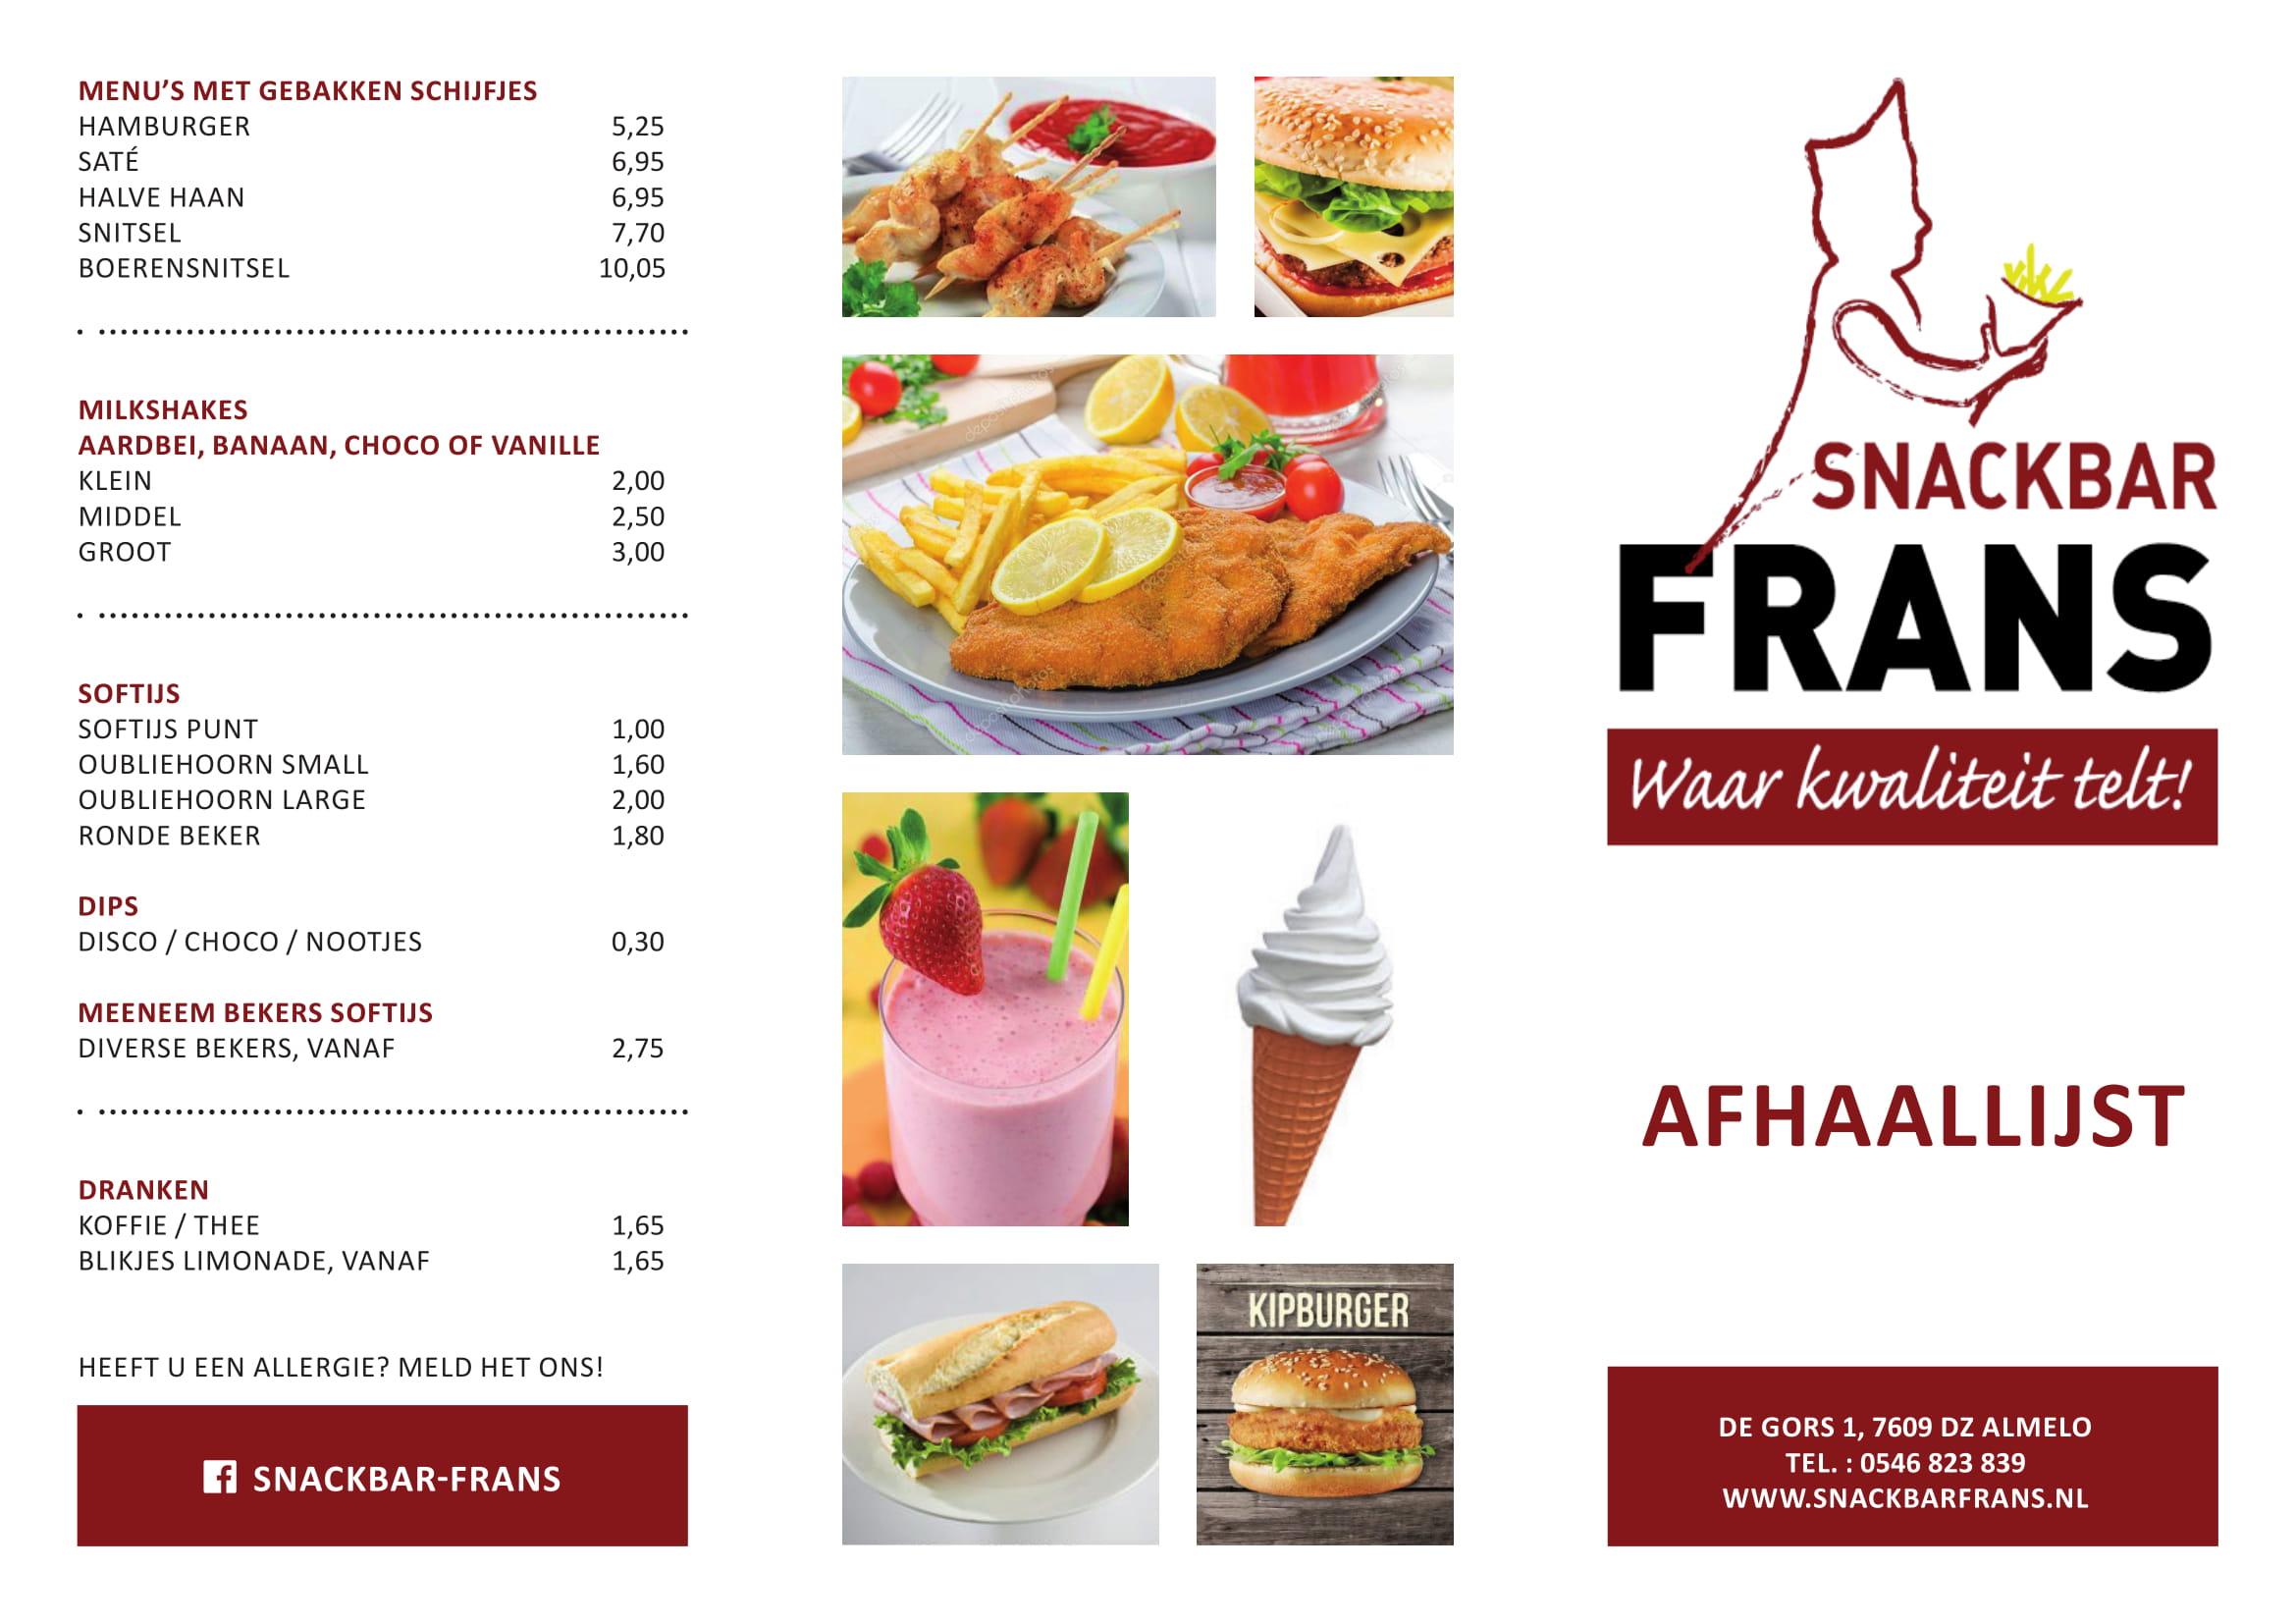 Snackbar Frans - afhaalkaart-1